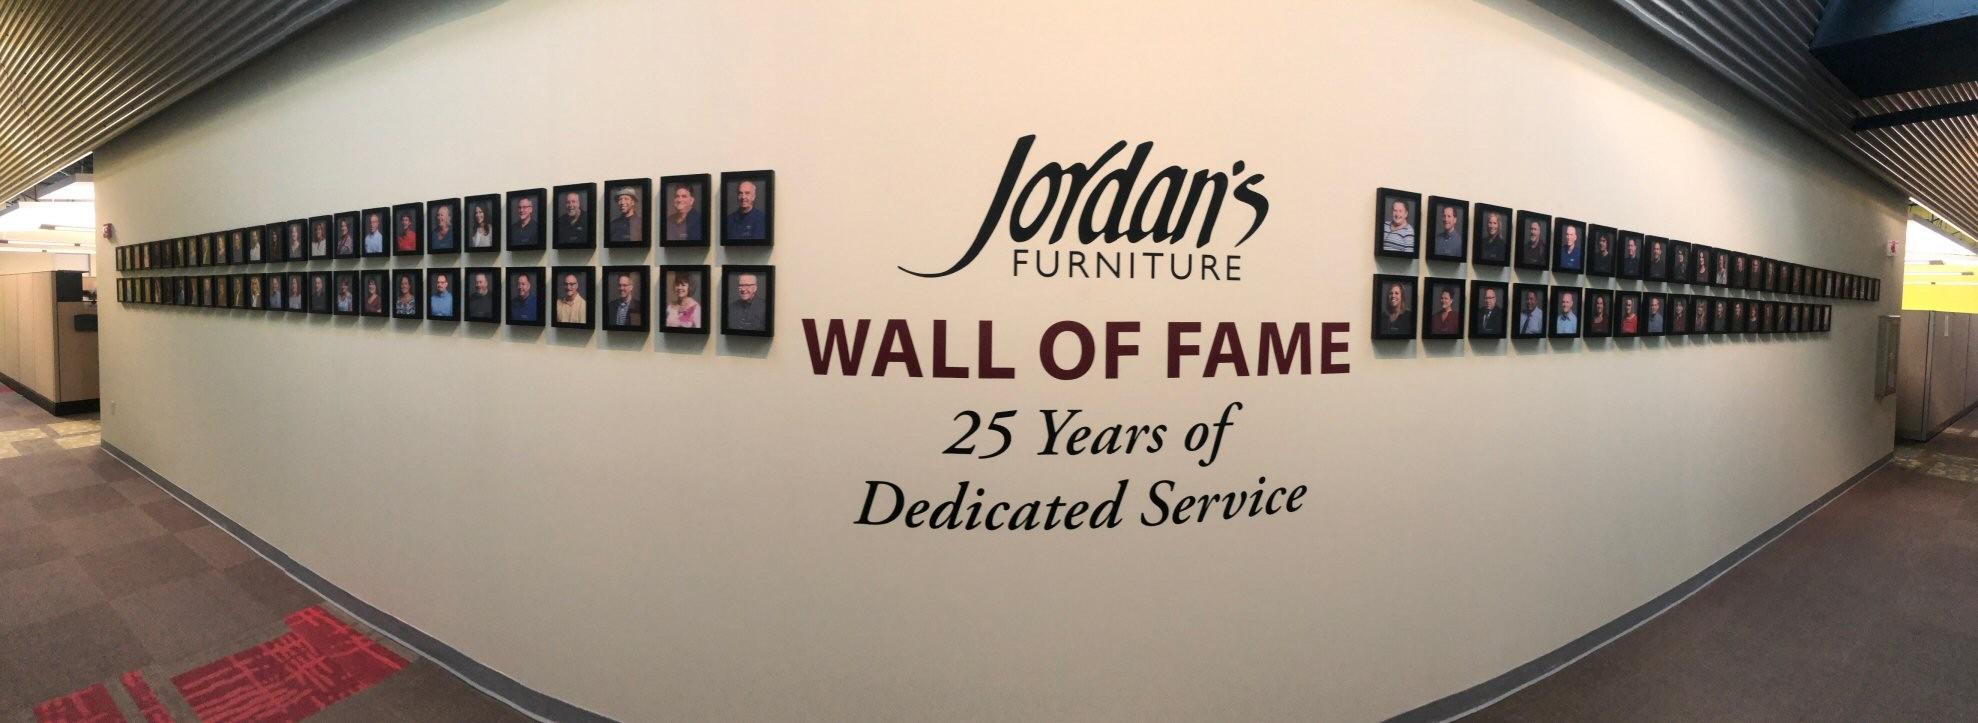 Jordan S Furniture Linkedin